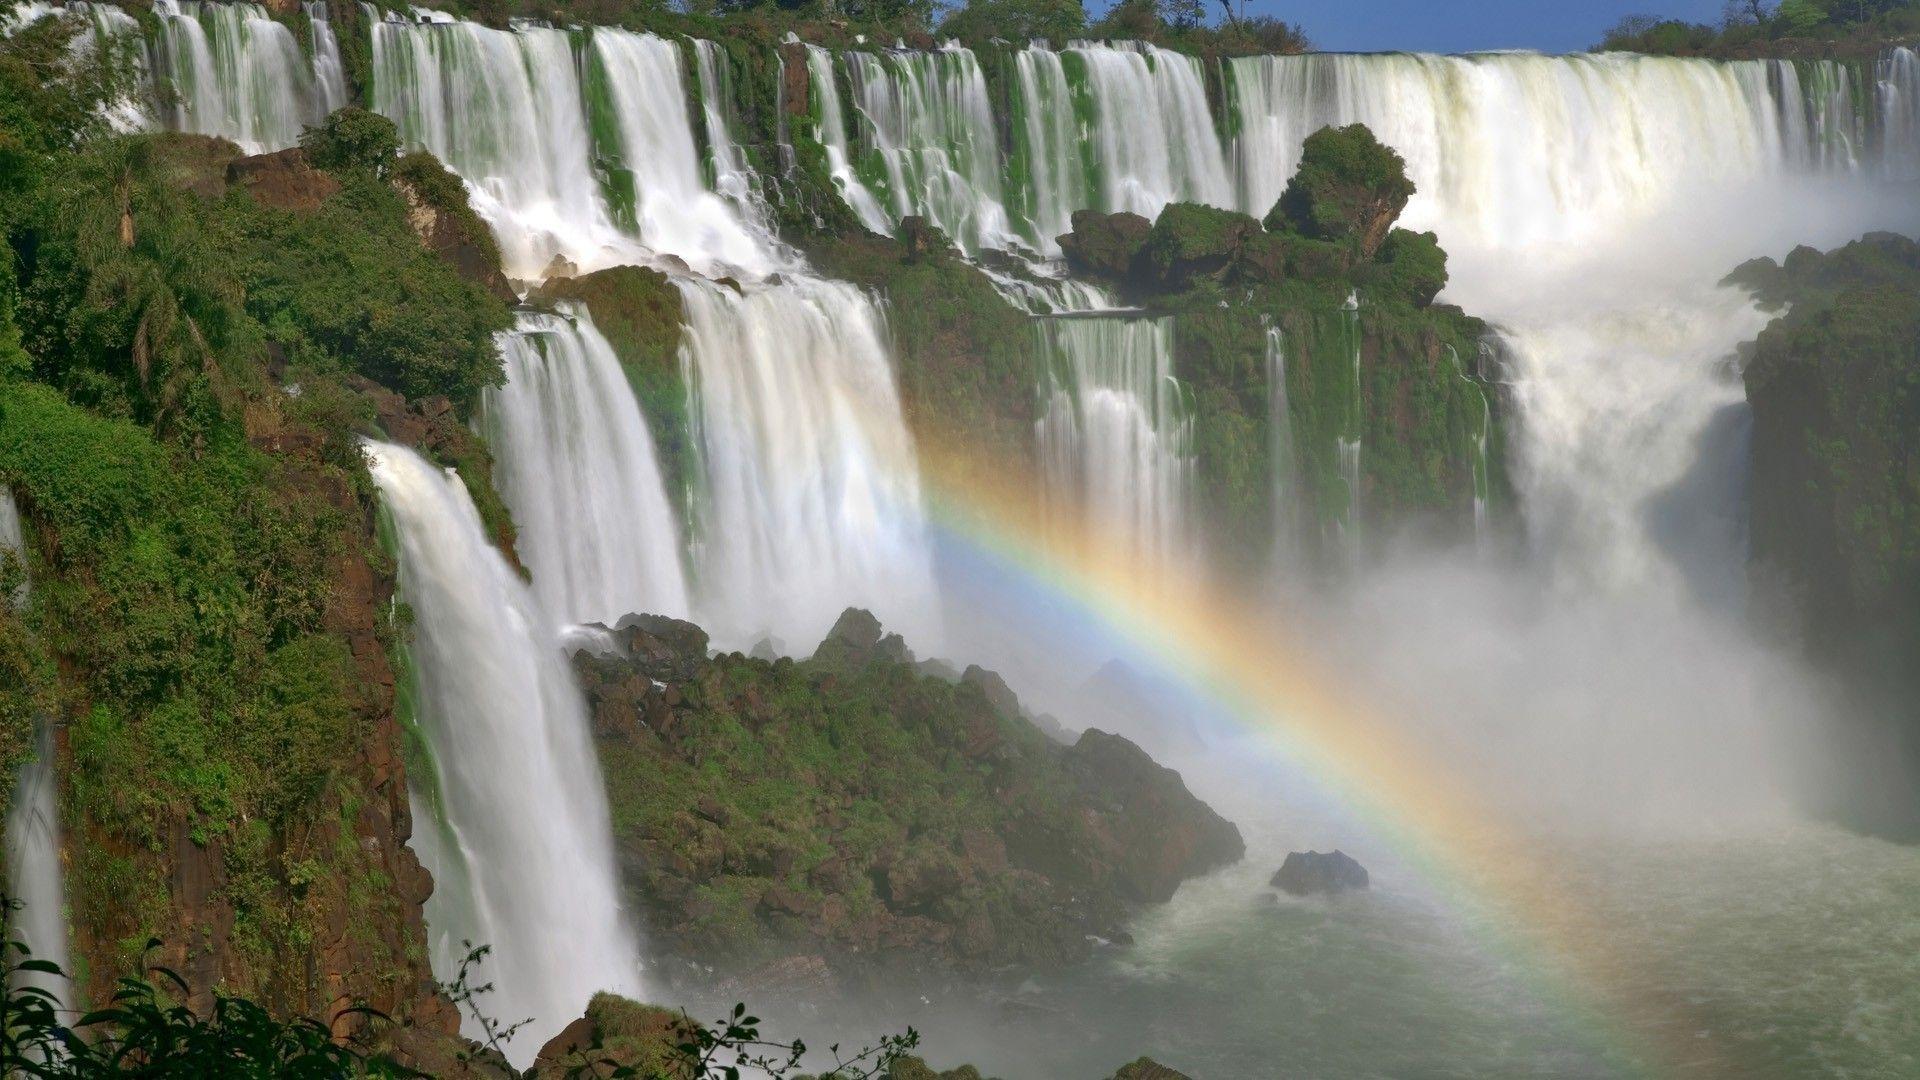 The Iguazu Falls Rainbow